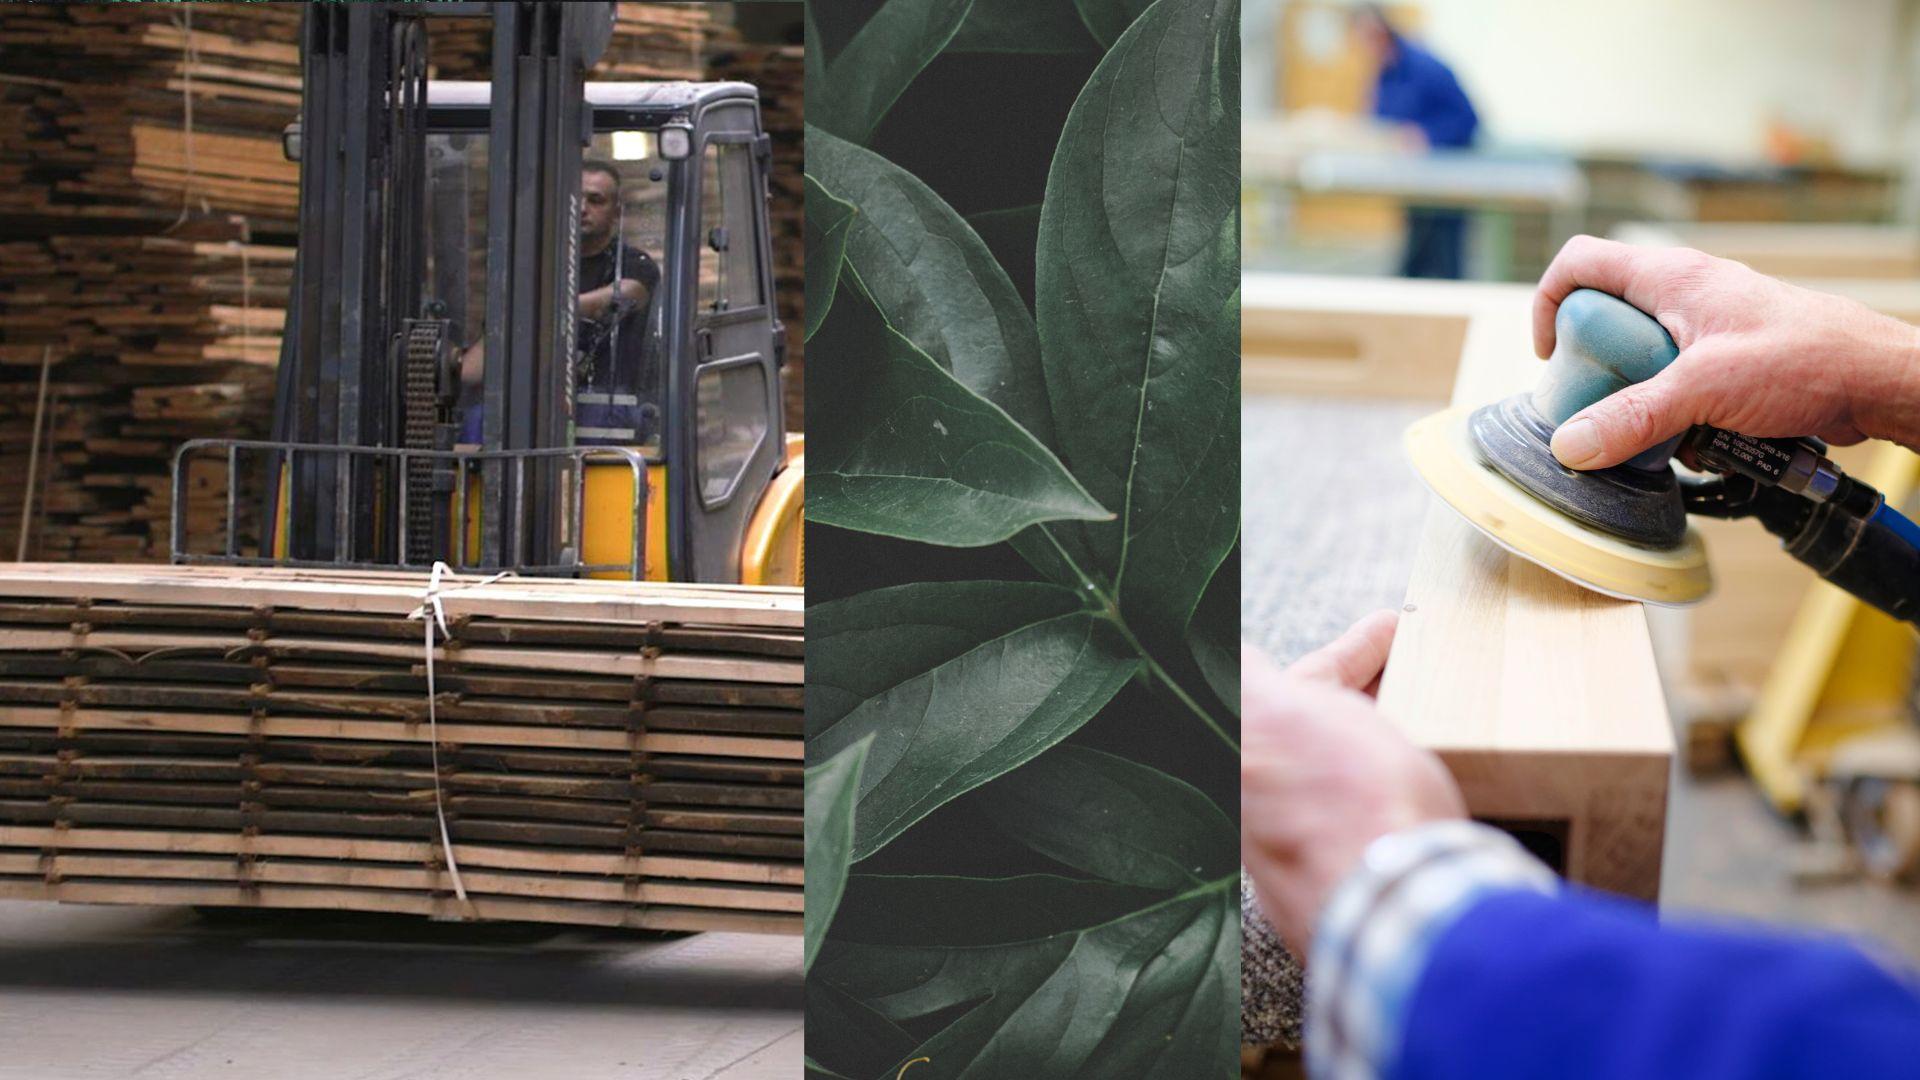 Qualitativ hochwertiges Holz wird bearbeitet